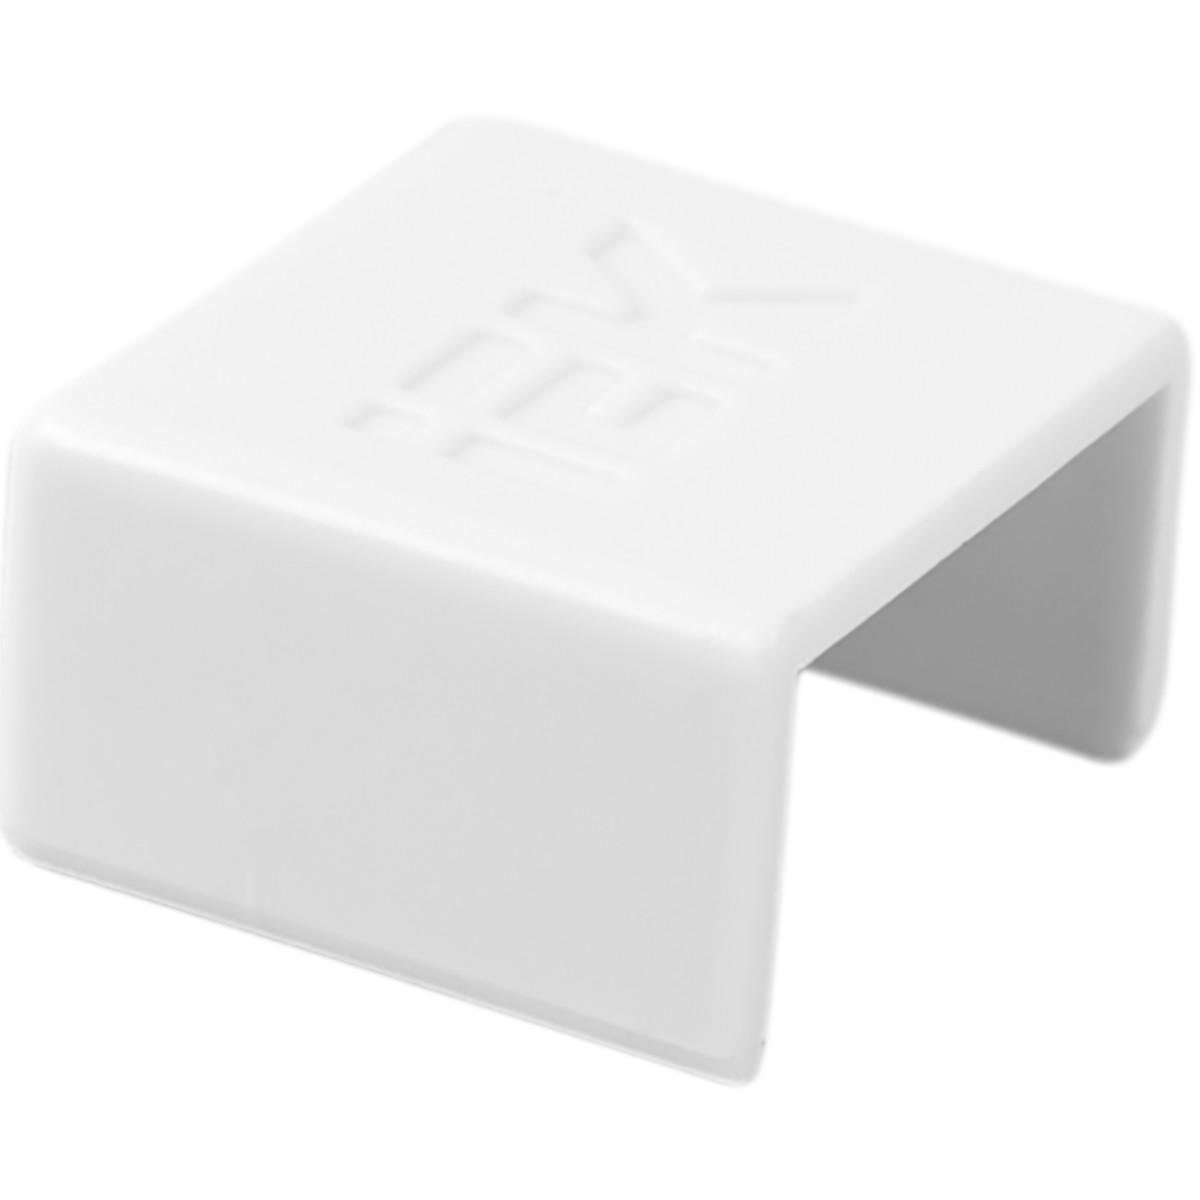 Заглушка IEK КМЗ 12/12 мм цвет белый 4 шт.